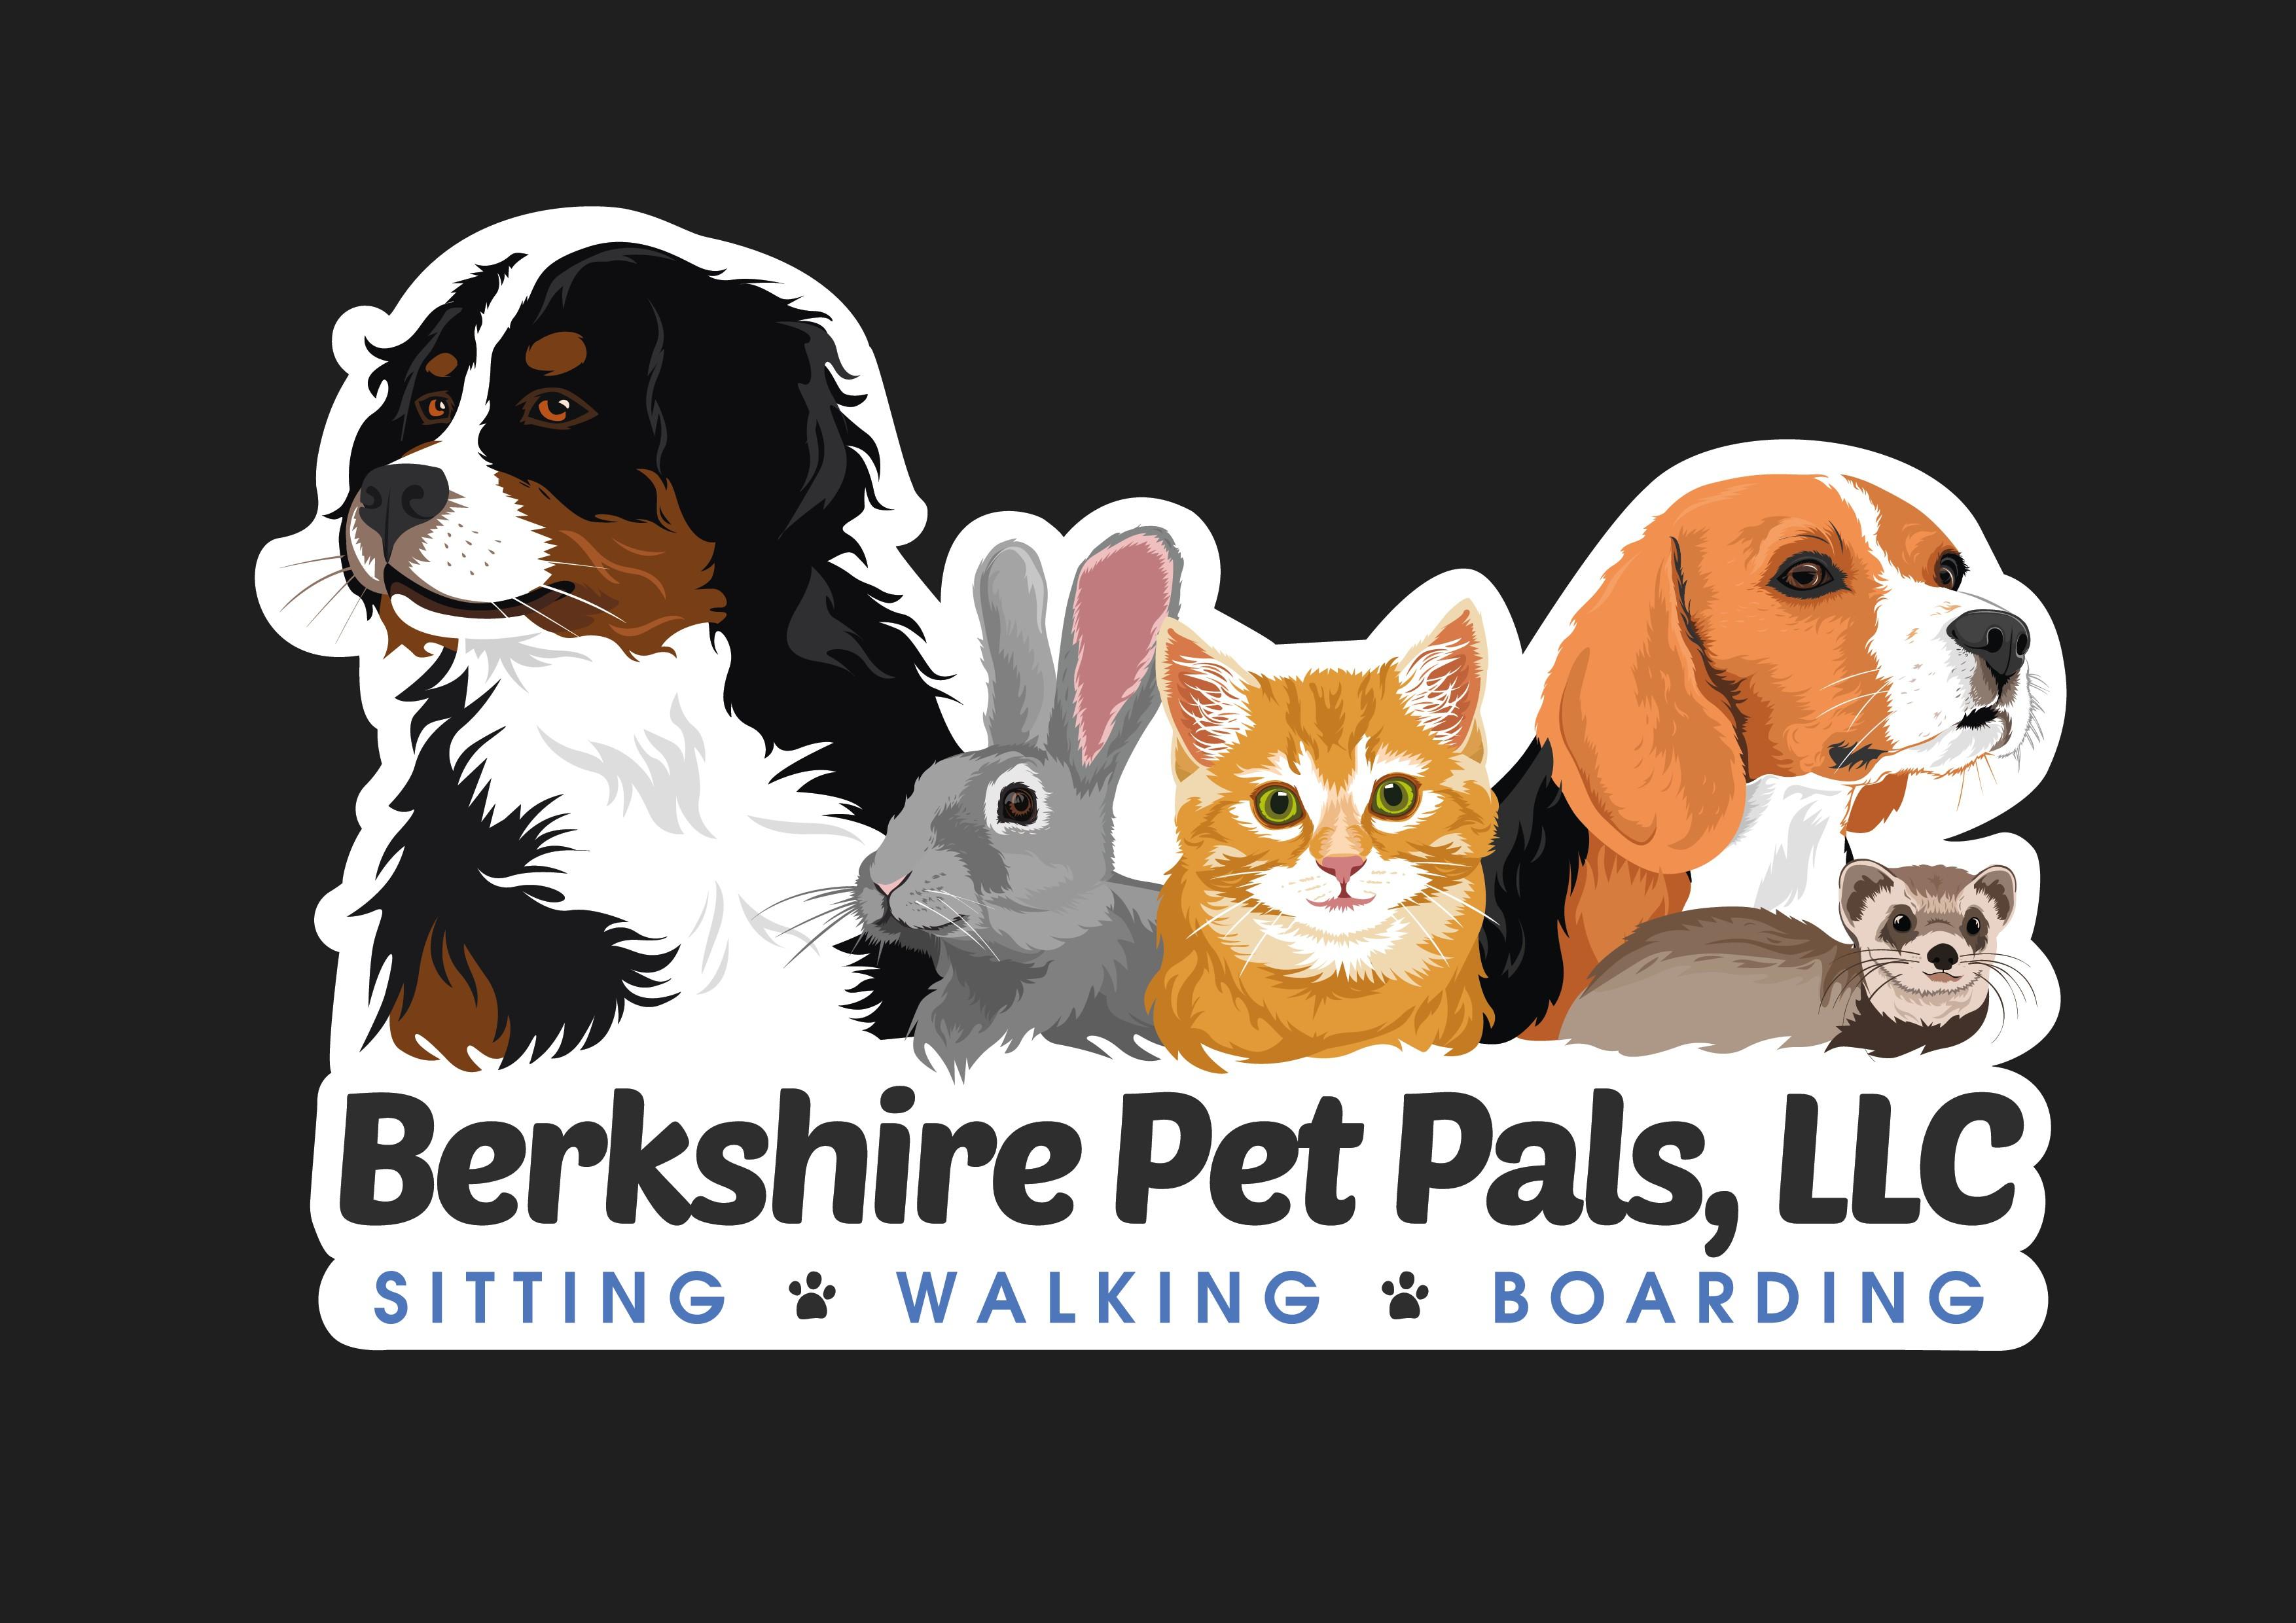 Updated logo needed for Berkshire Pet Pals, LLC!